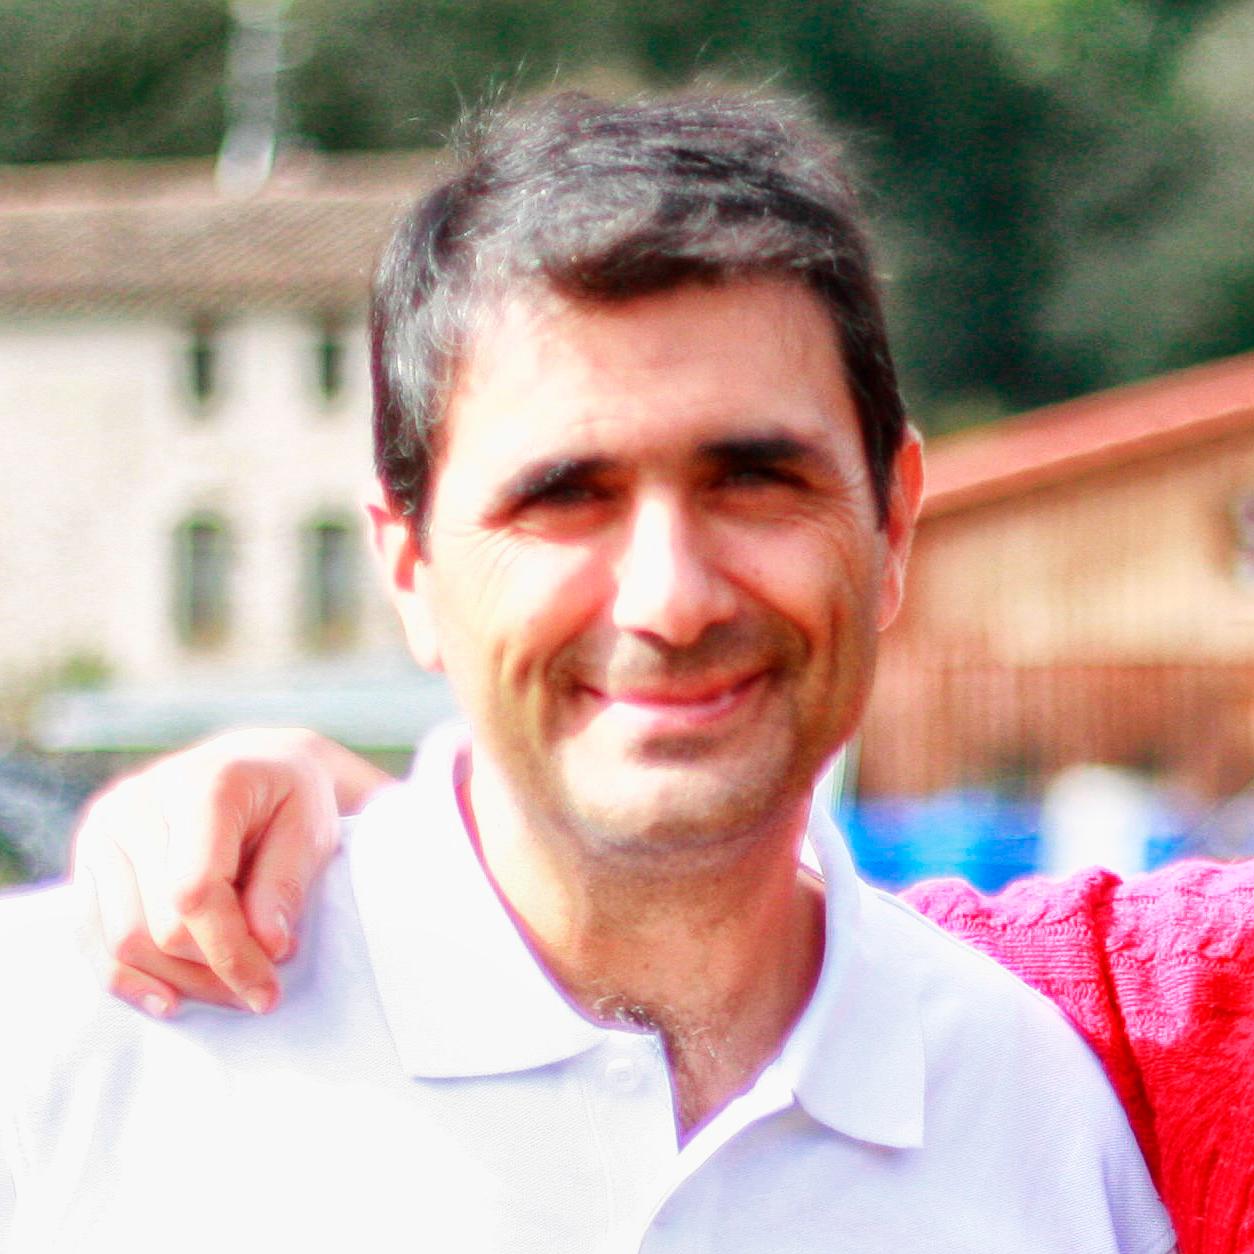 JUAN LUIS DOMINGUEZ